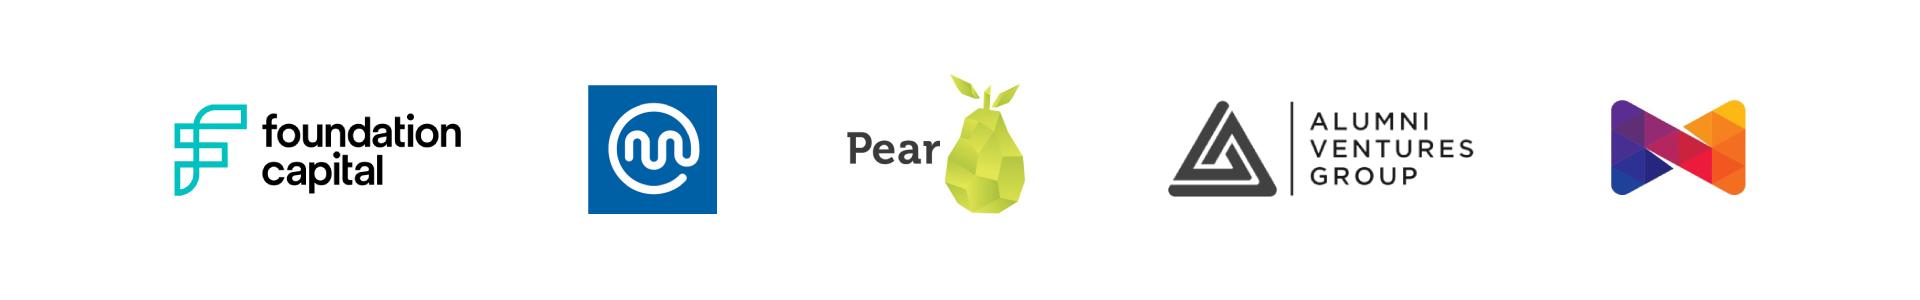 Relay investors logos image